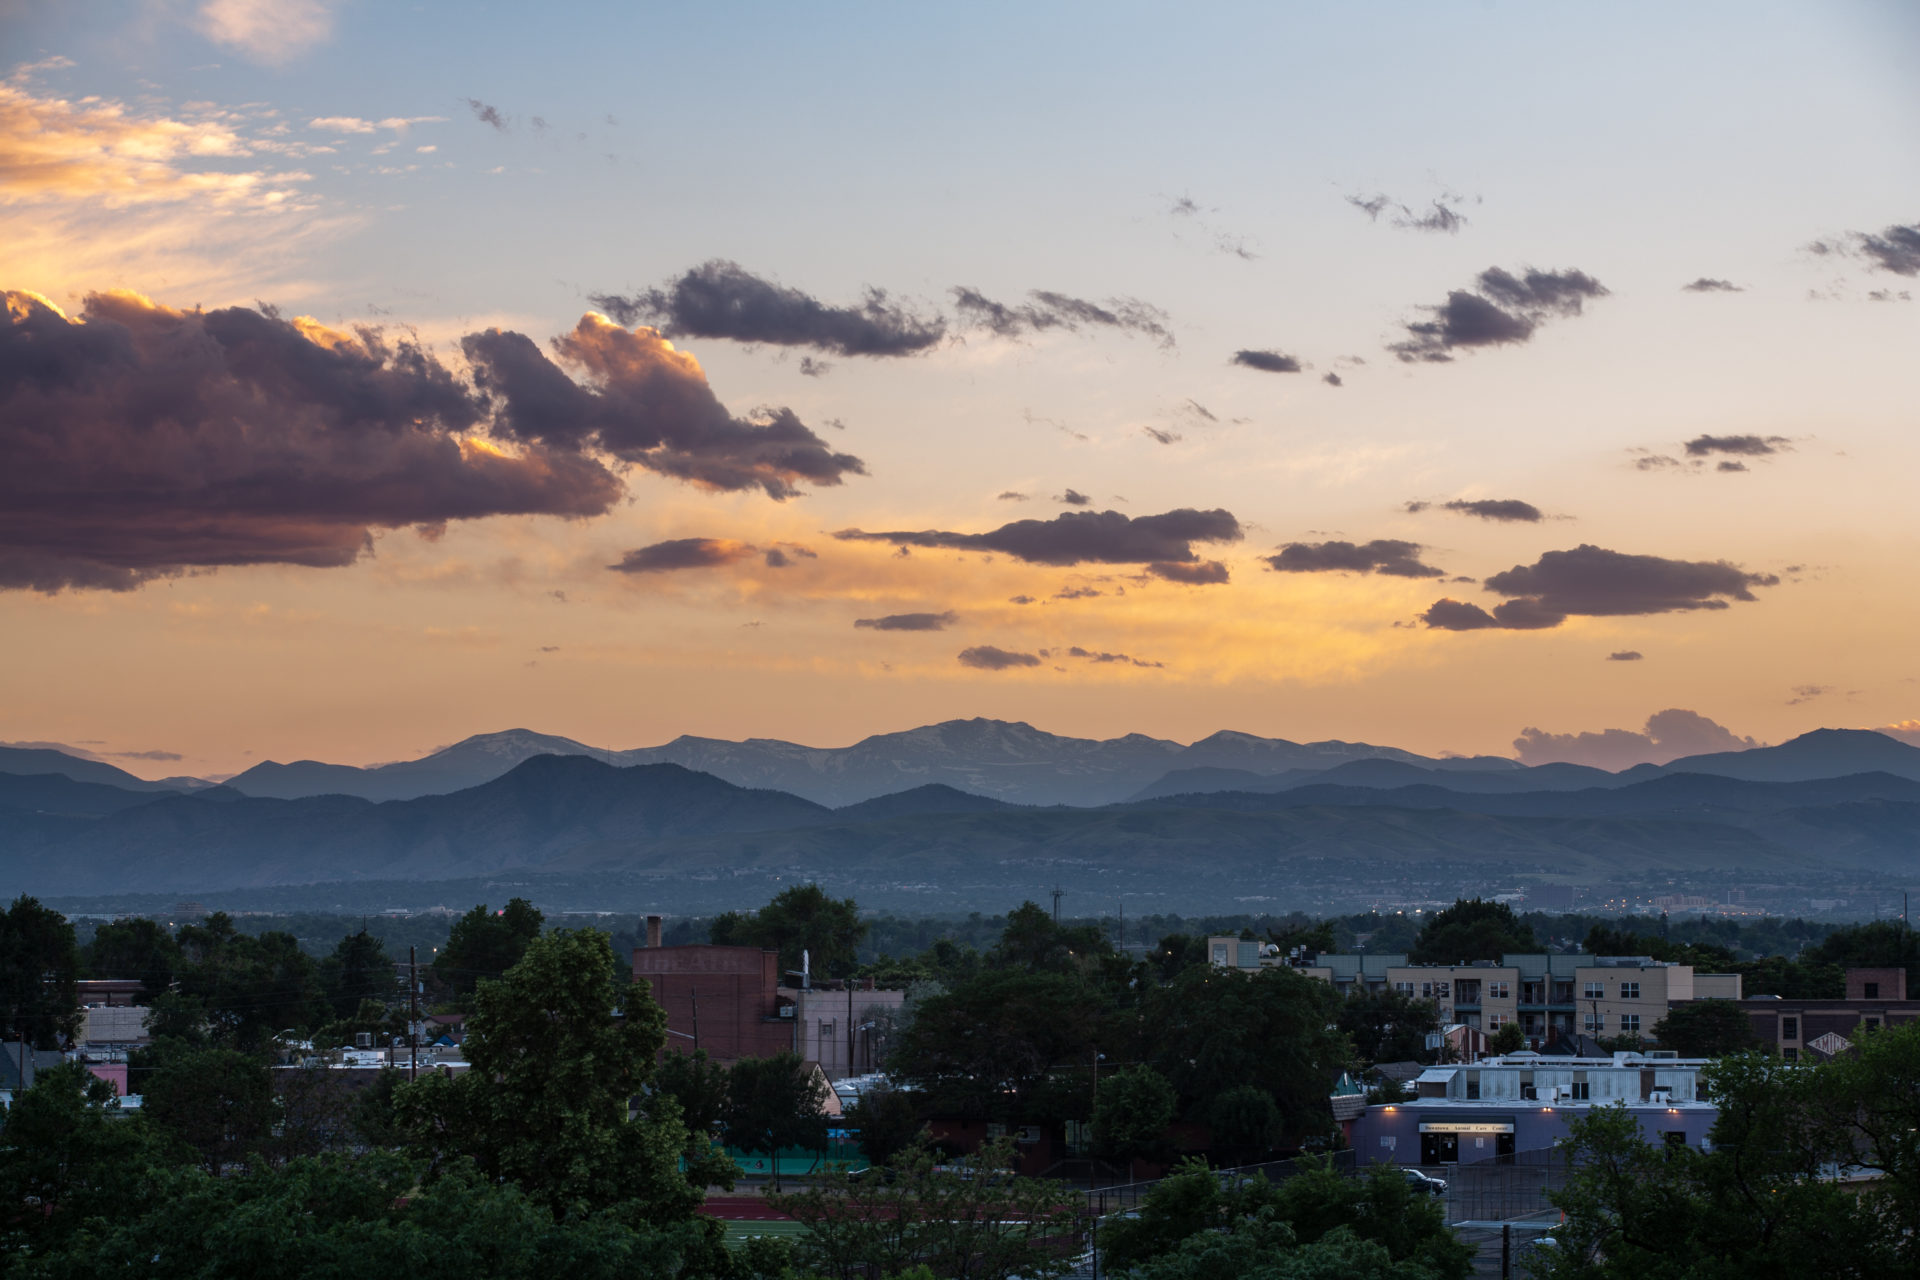 Mount Evans sunset - June 23, 2011